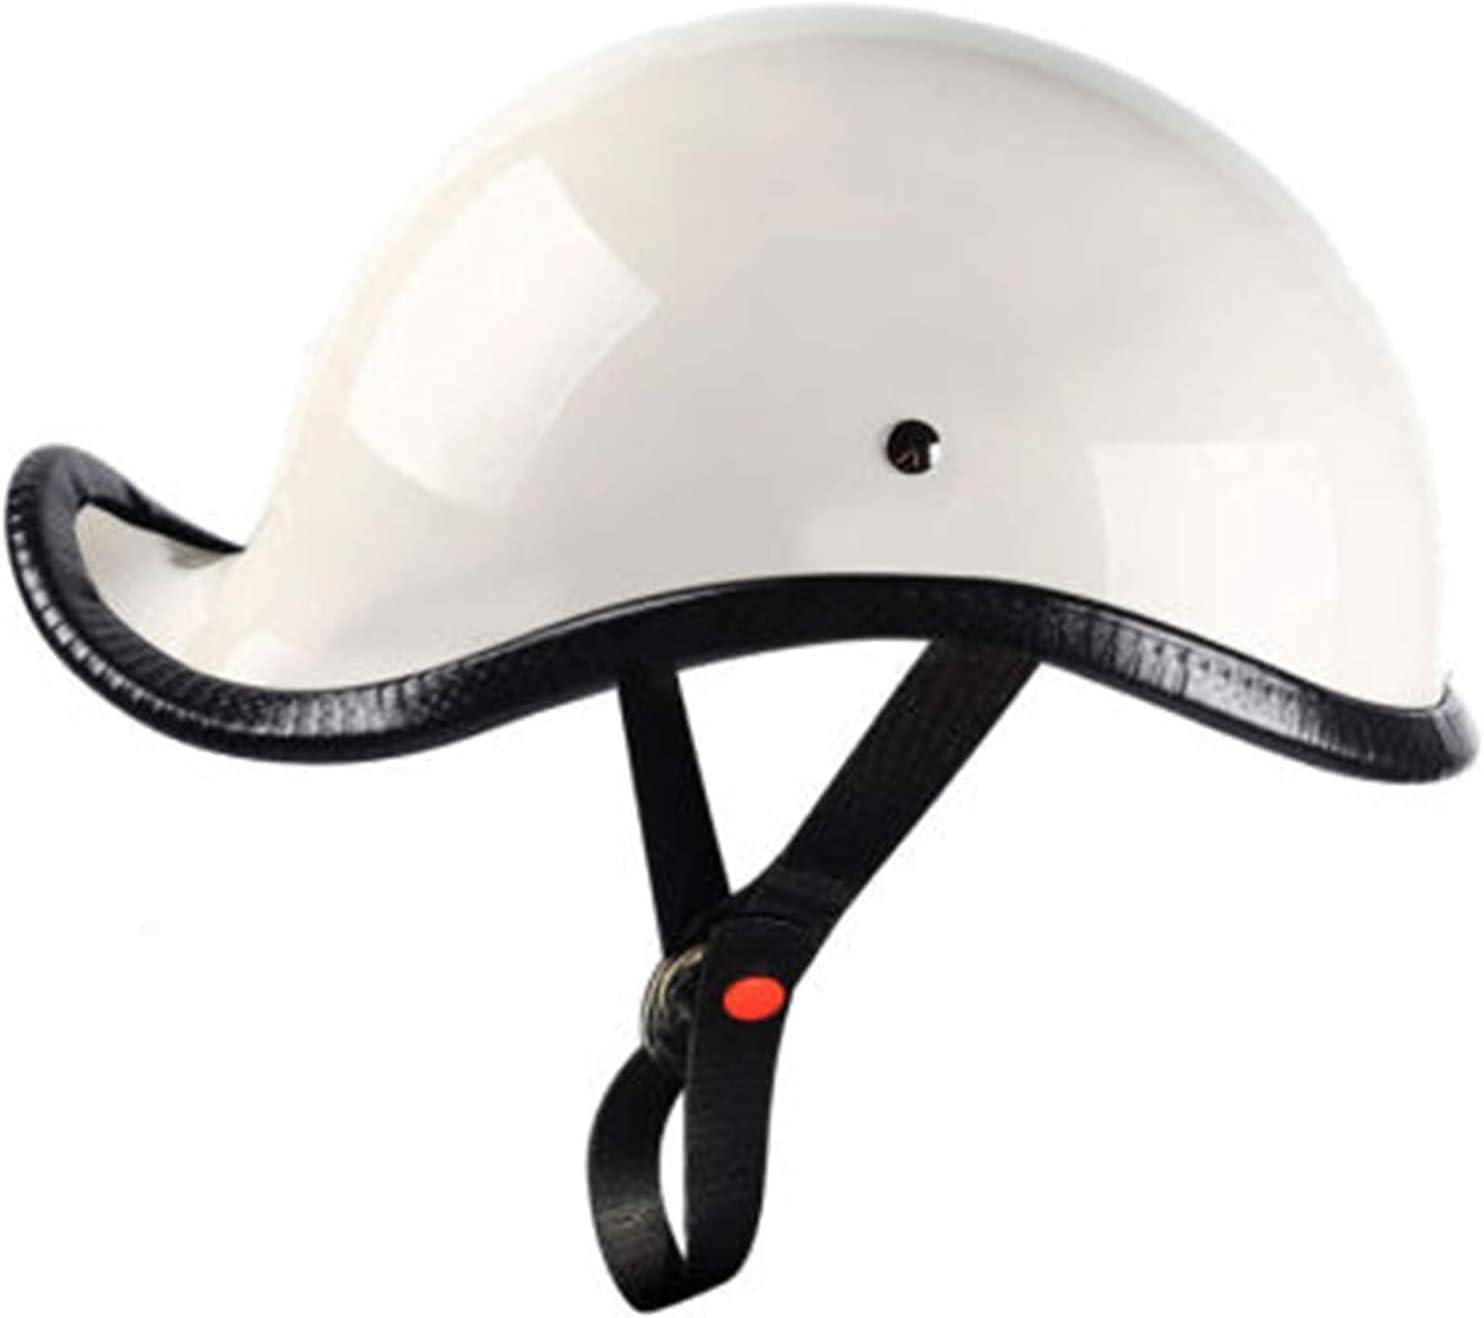 WANGFENG Retro Half Helmet DOT Certified Face Hel Motorbike gift Open low-pricing